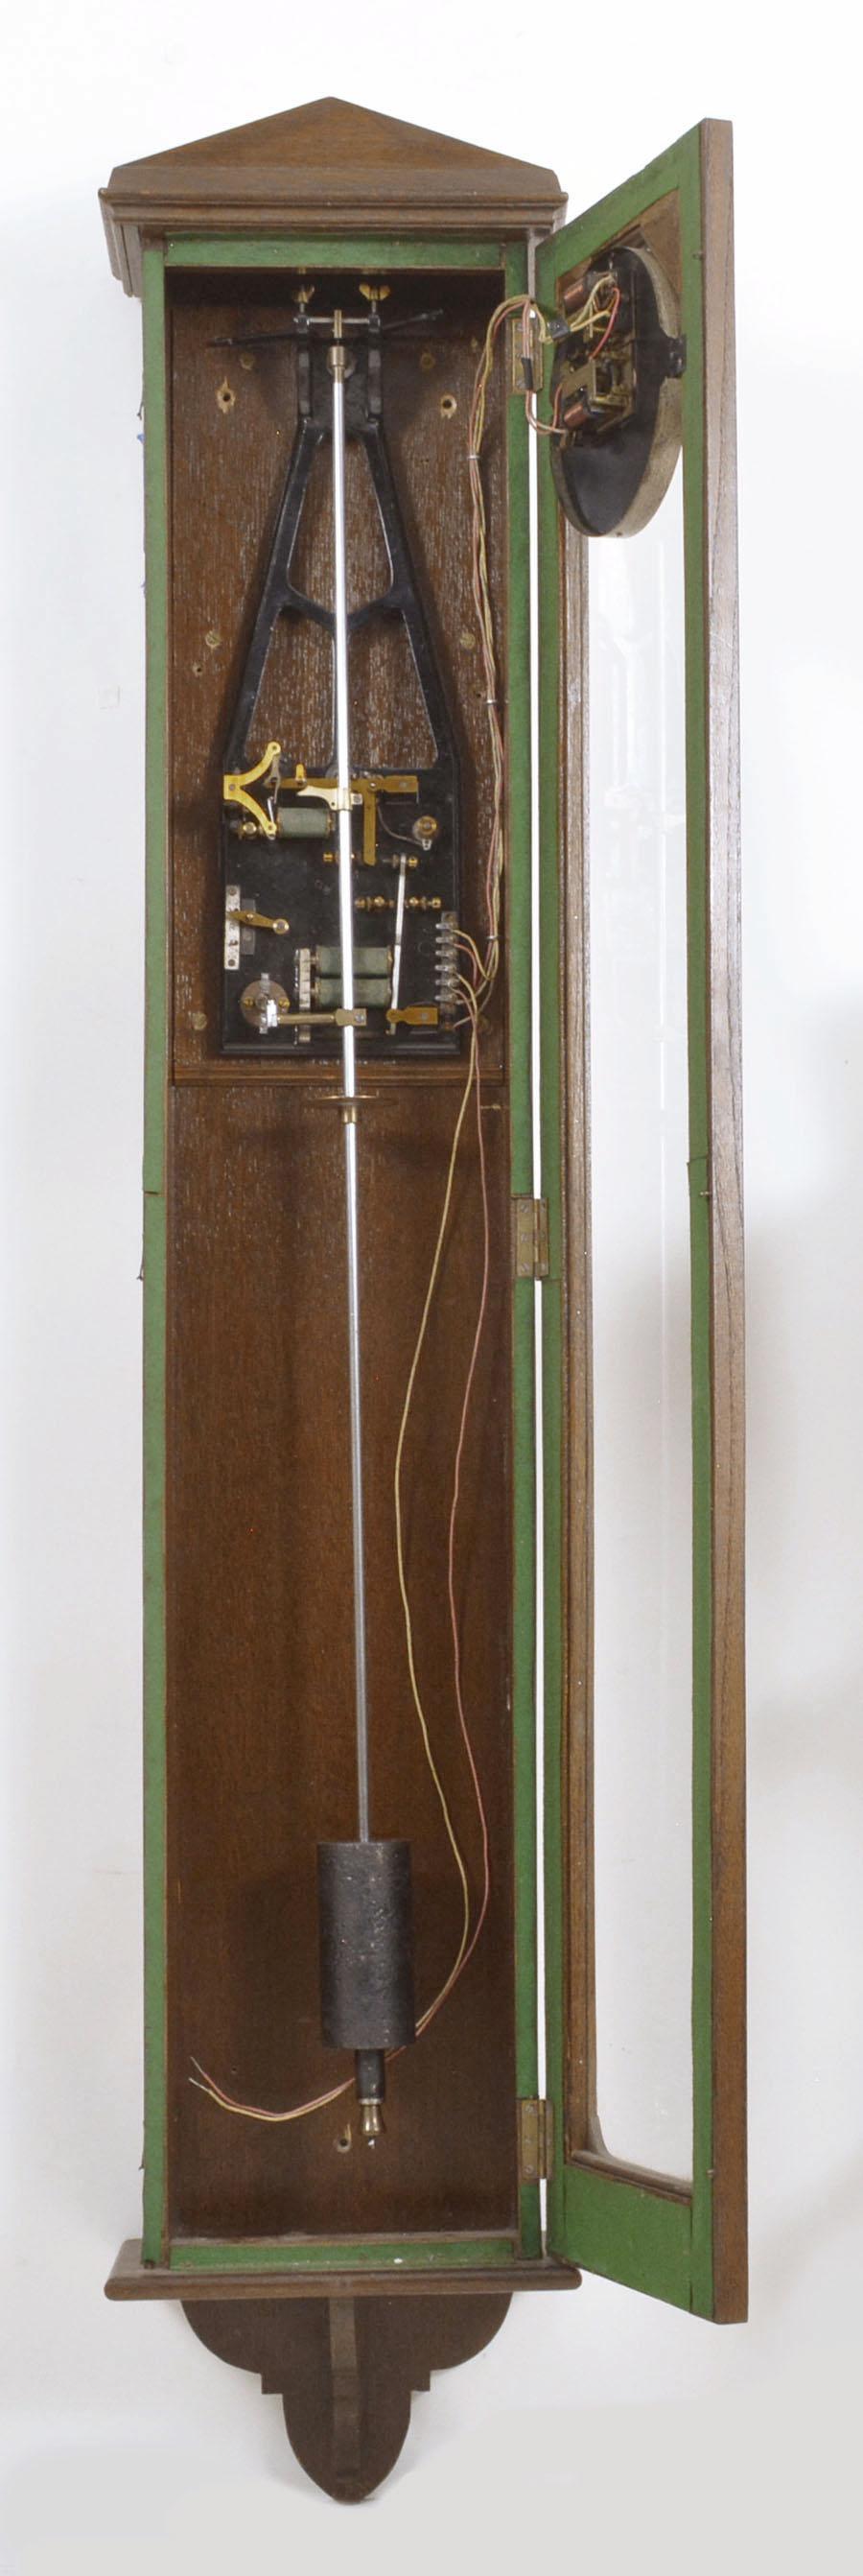 Synchronome Magnetic Free Pendulum Clock Prototype